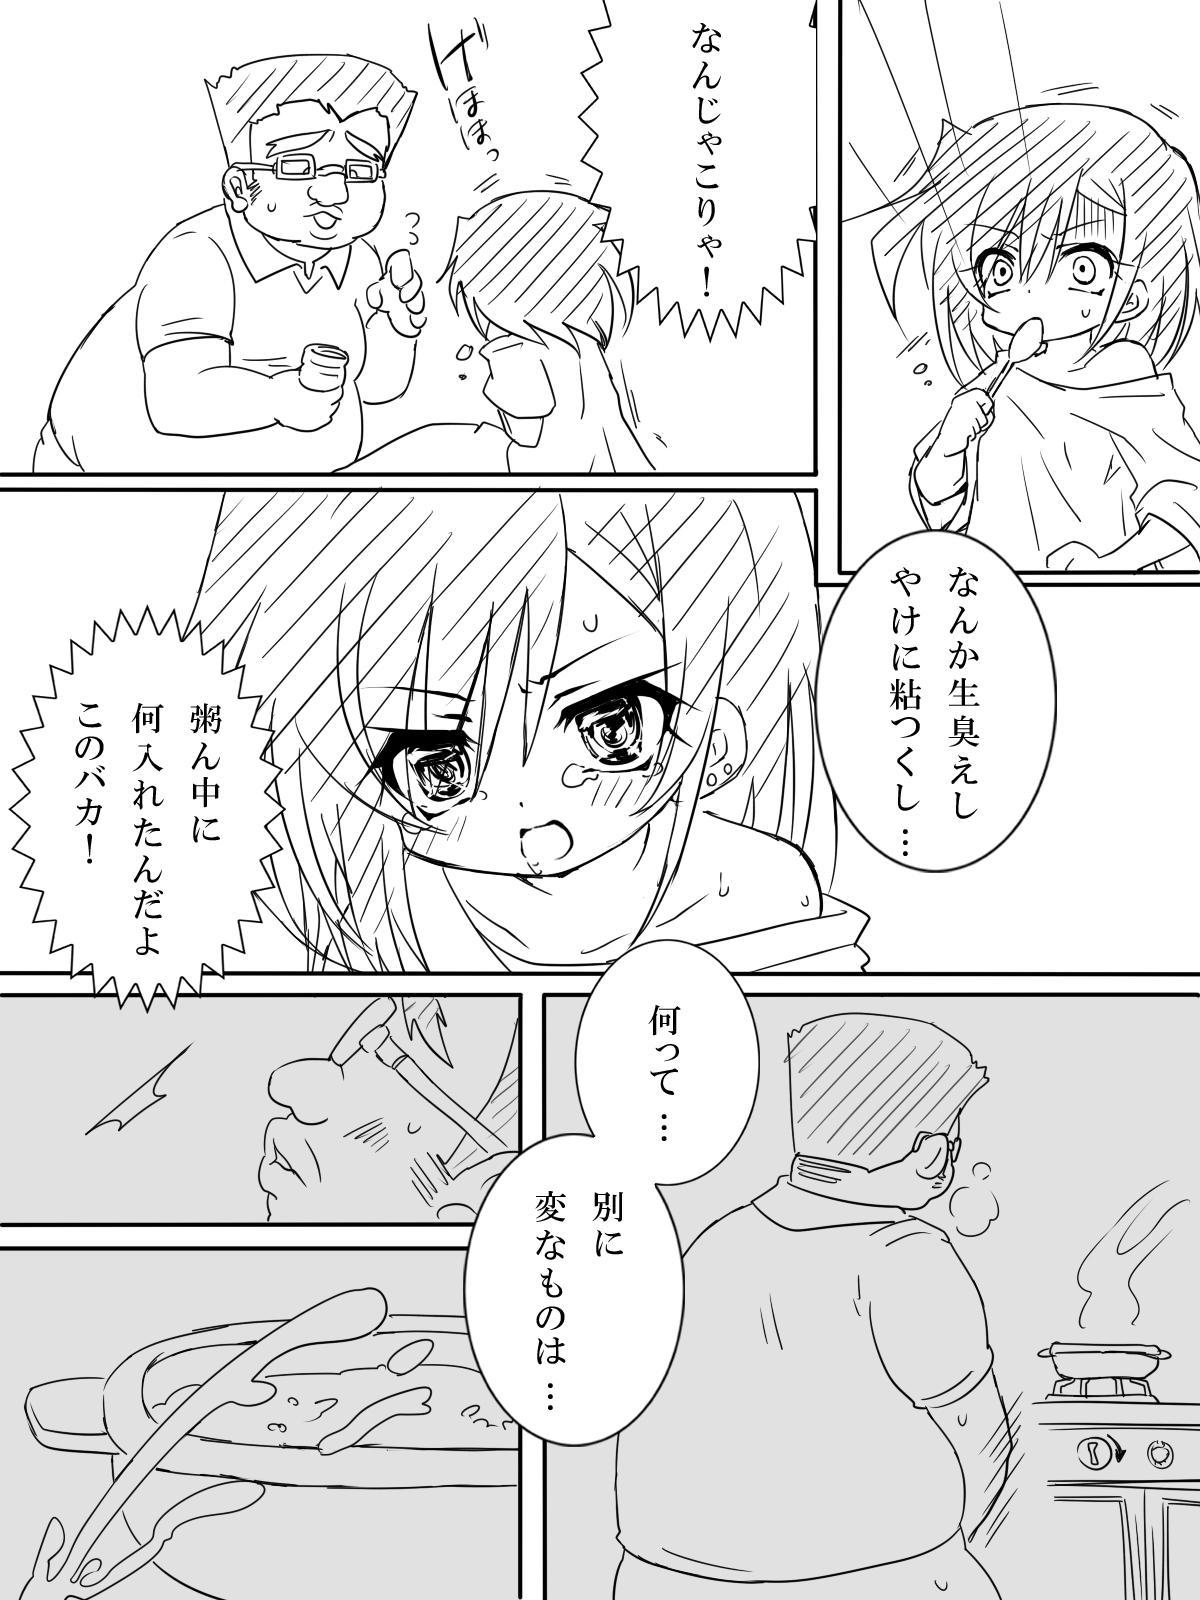 TS Onii-chan 6